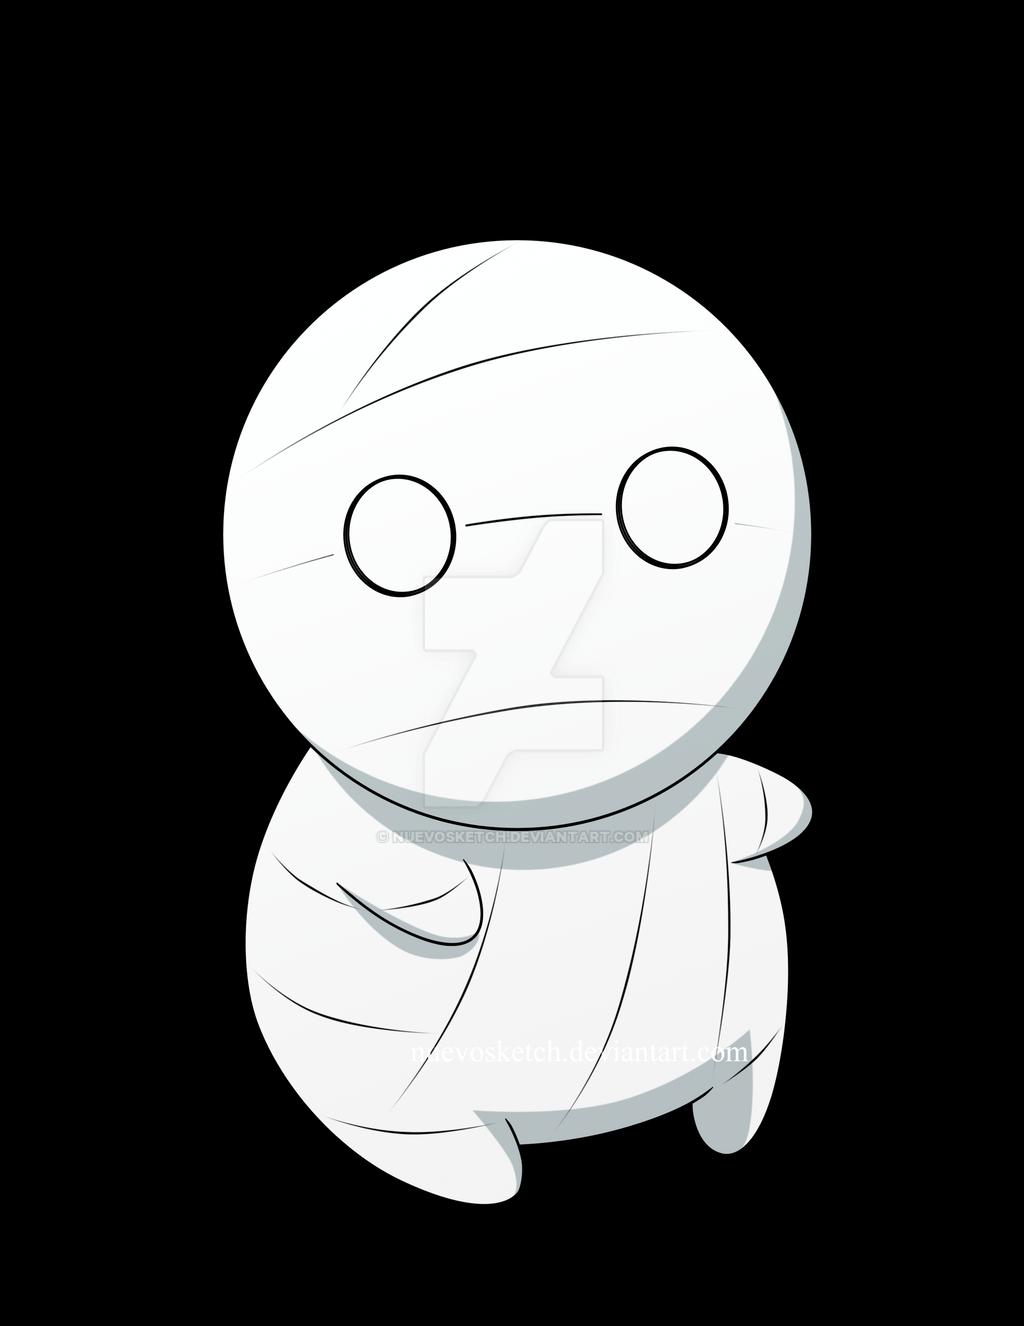 B Day 445 Mii Kun By Nuevosketch On Deviantart How to keep a mummy. b day 445 mii kun by nuevosketch on